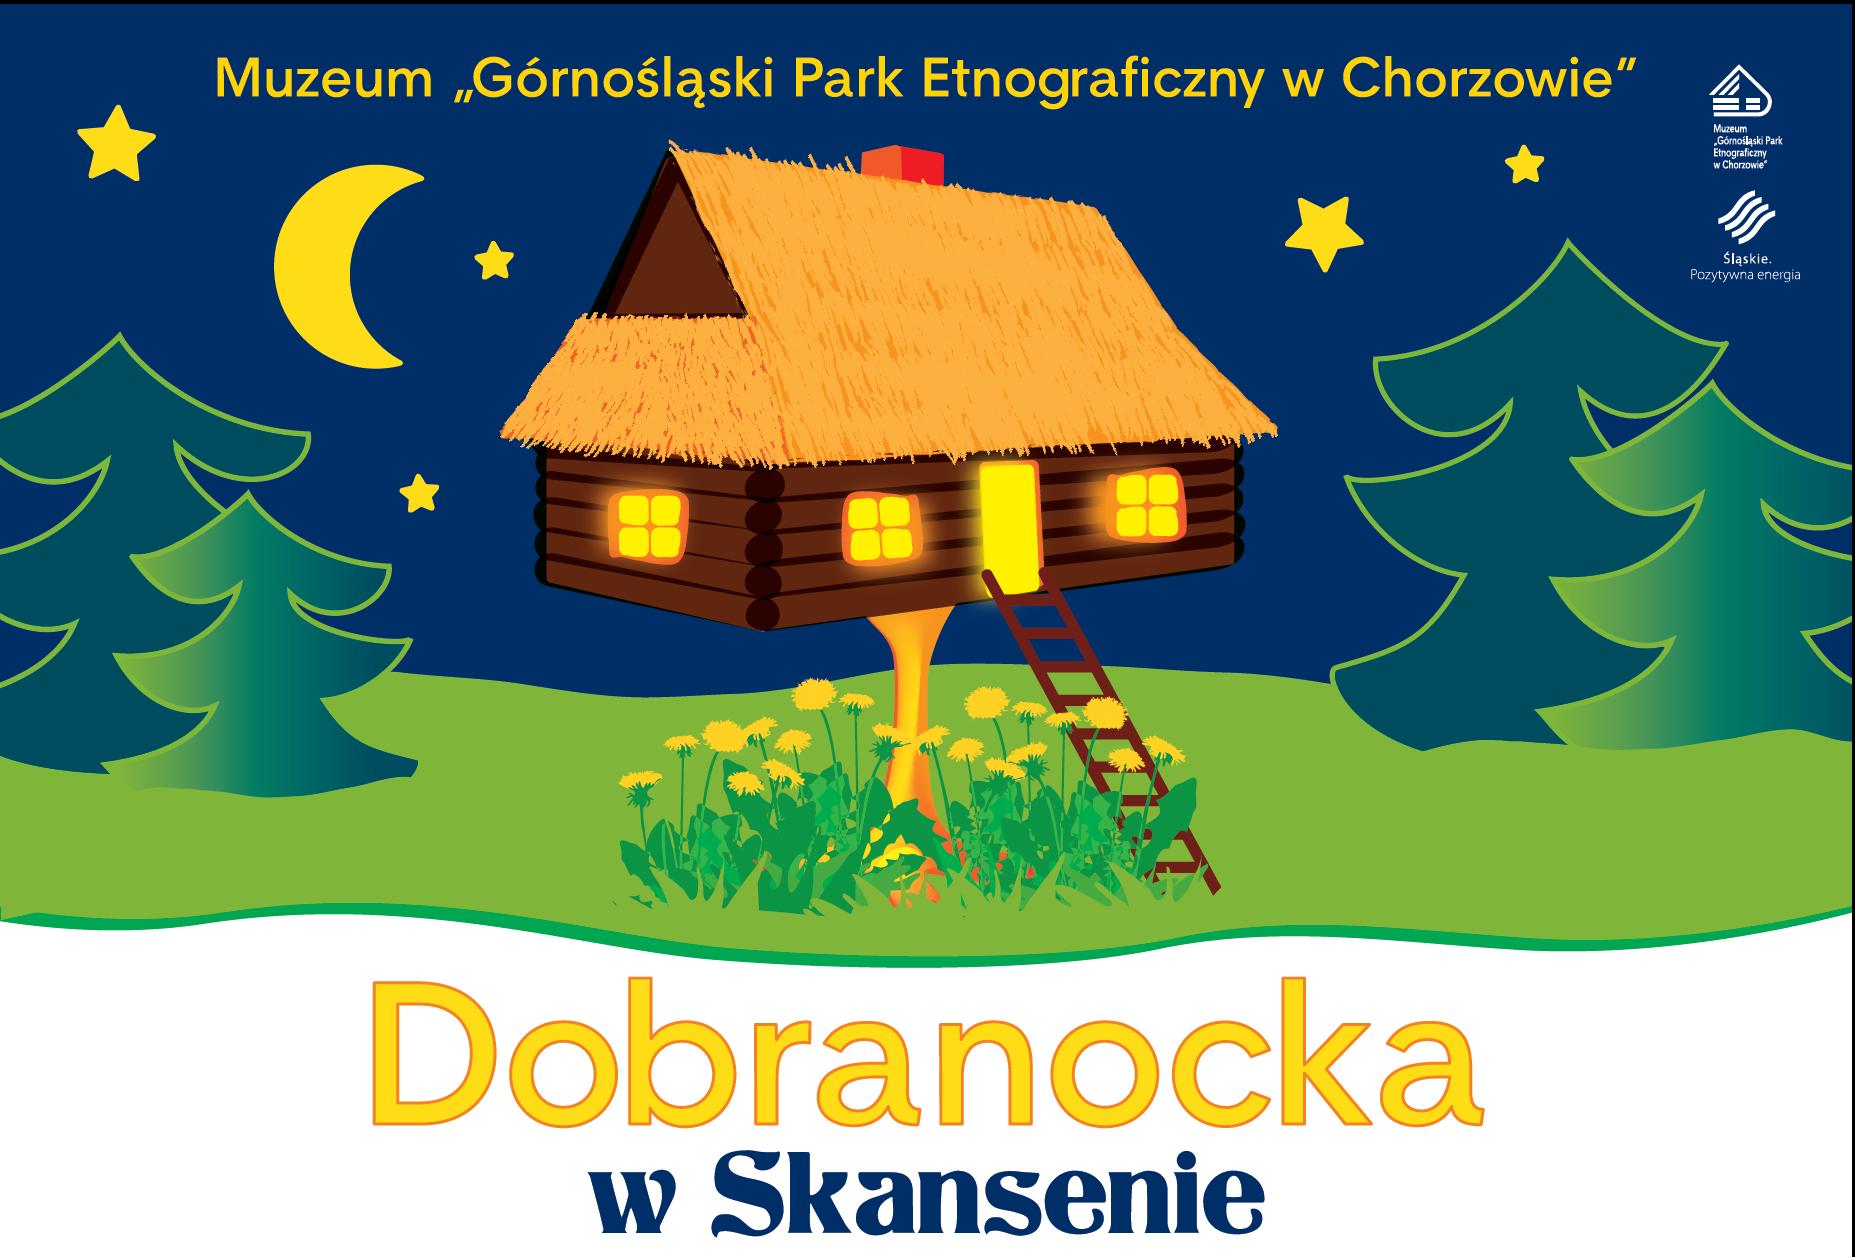 Dobranocka w Skansenie